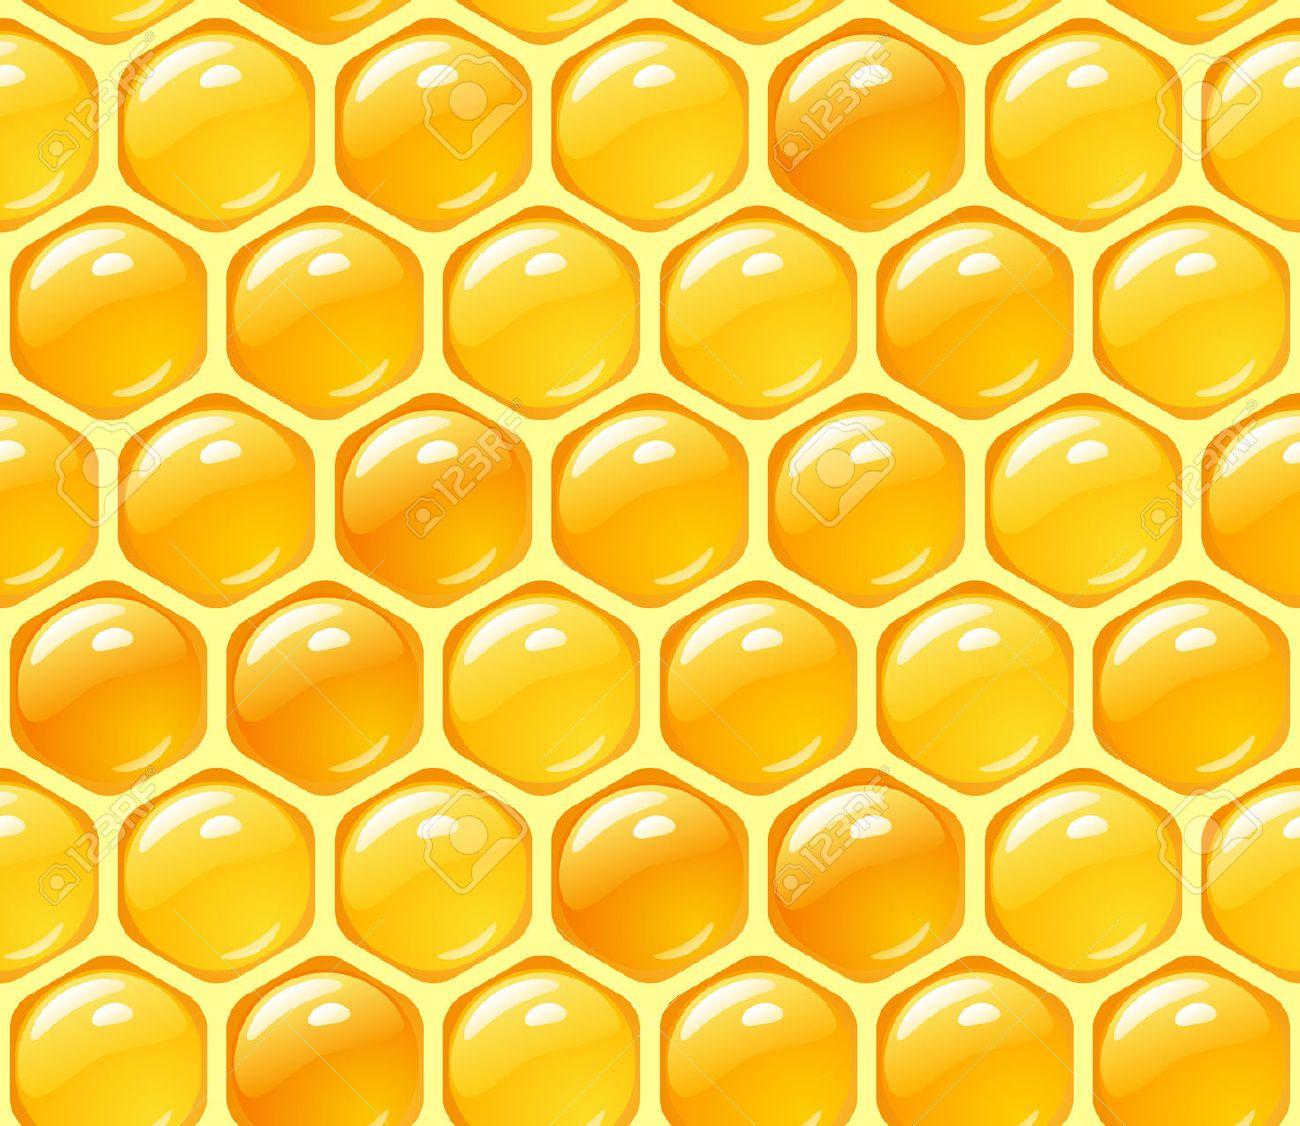 Bee Hive Vector Gallery Vector graphics design, Free